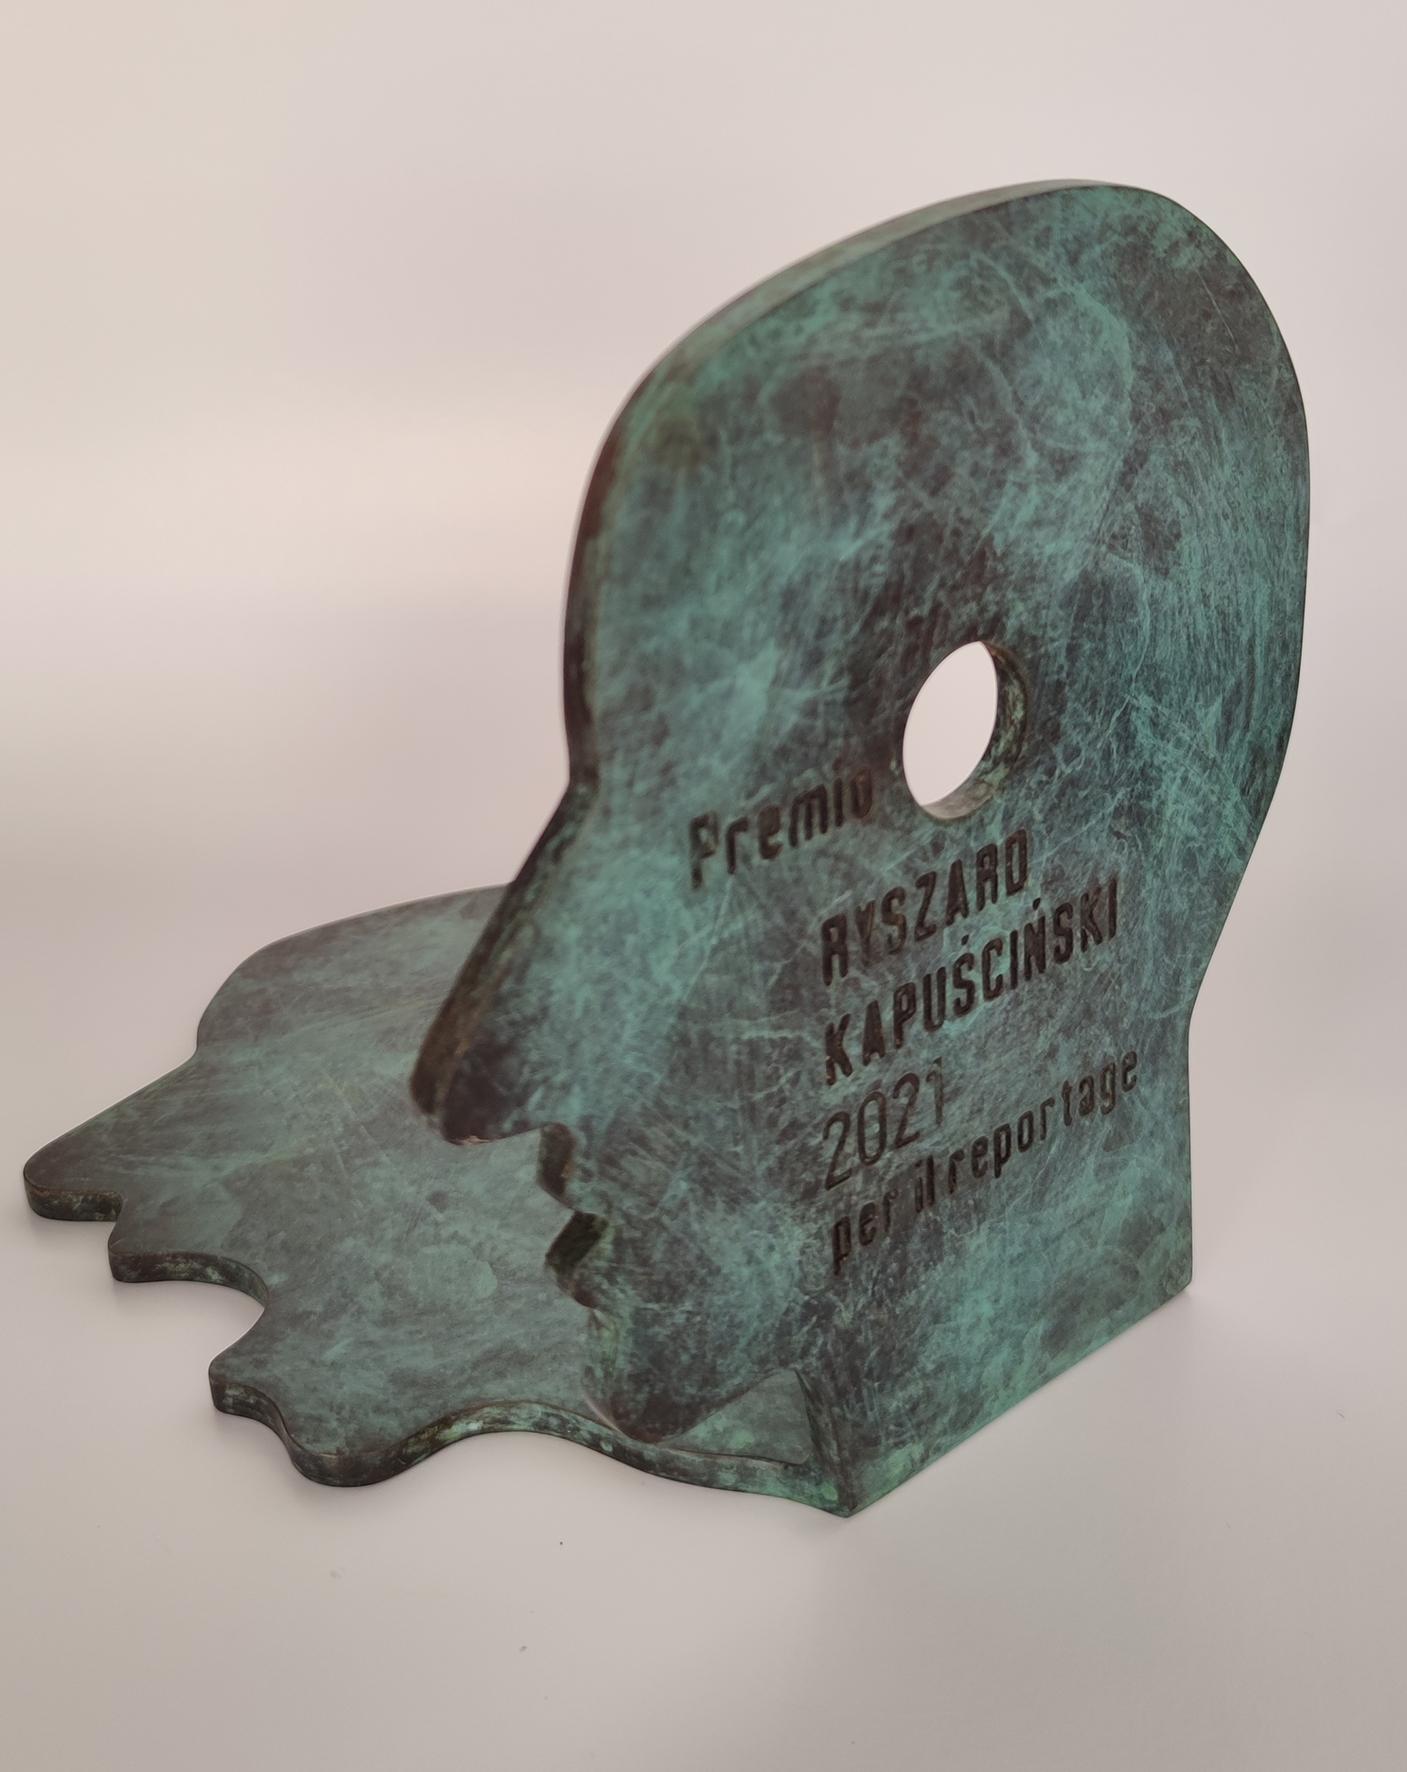 Premio Kapuściński 2021